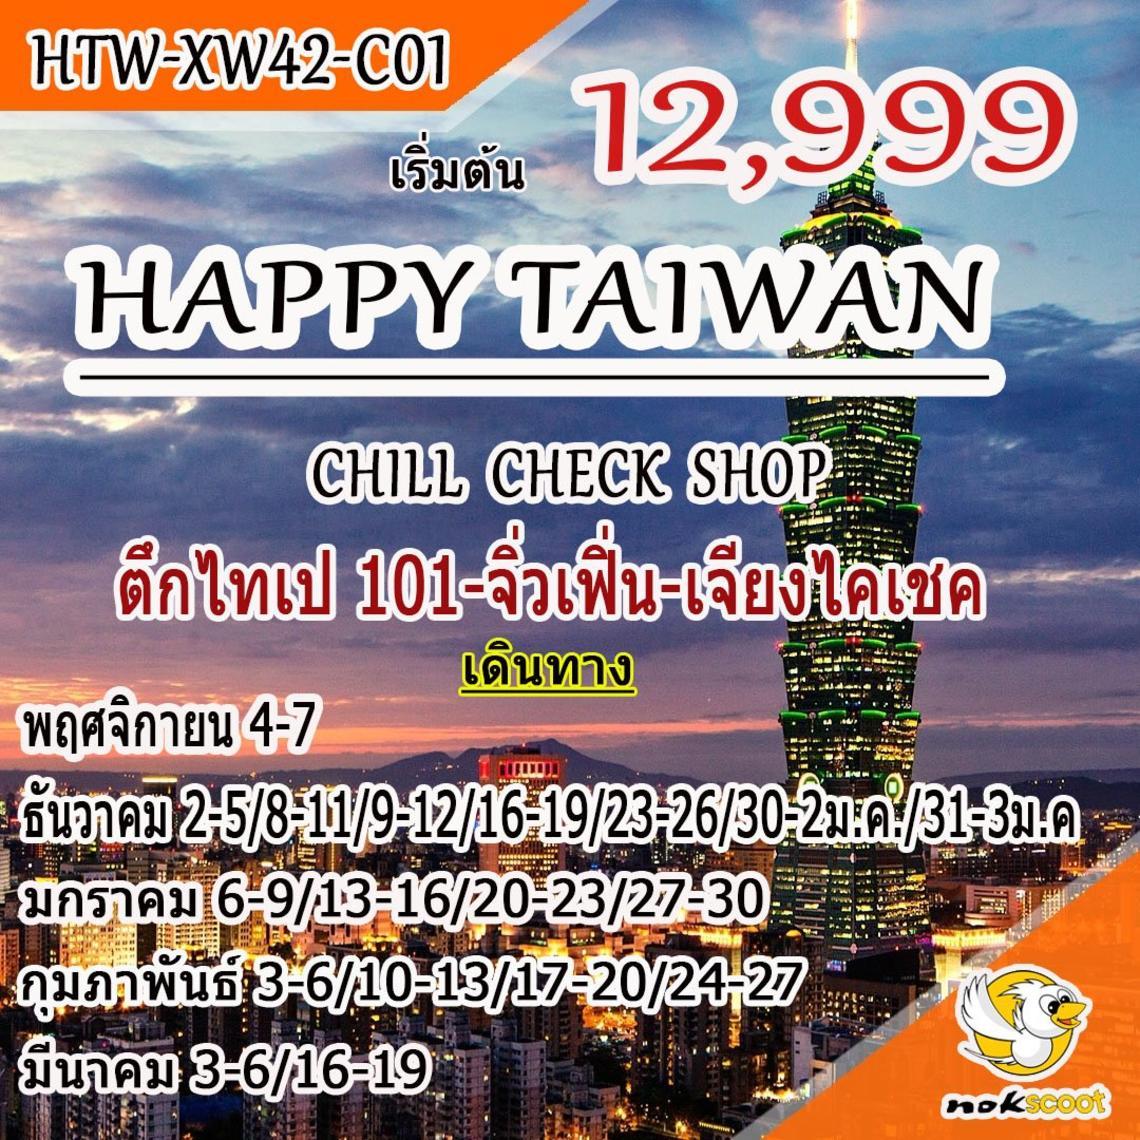 HTW-XW42-C01 HAPPY TAIWAN ชิลล์ เช็ค ช้อป